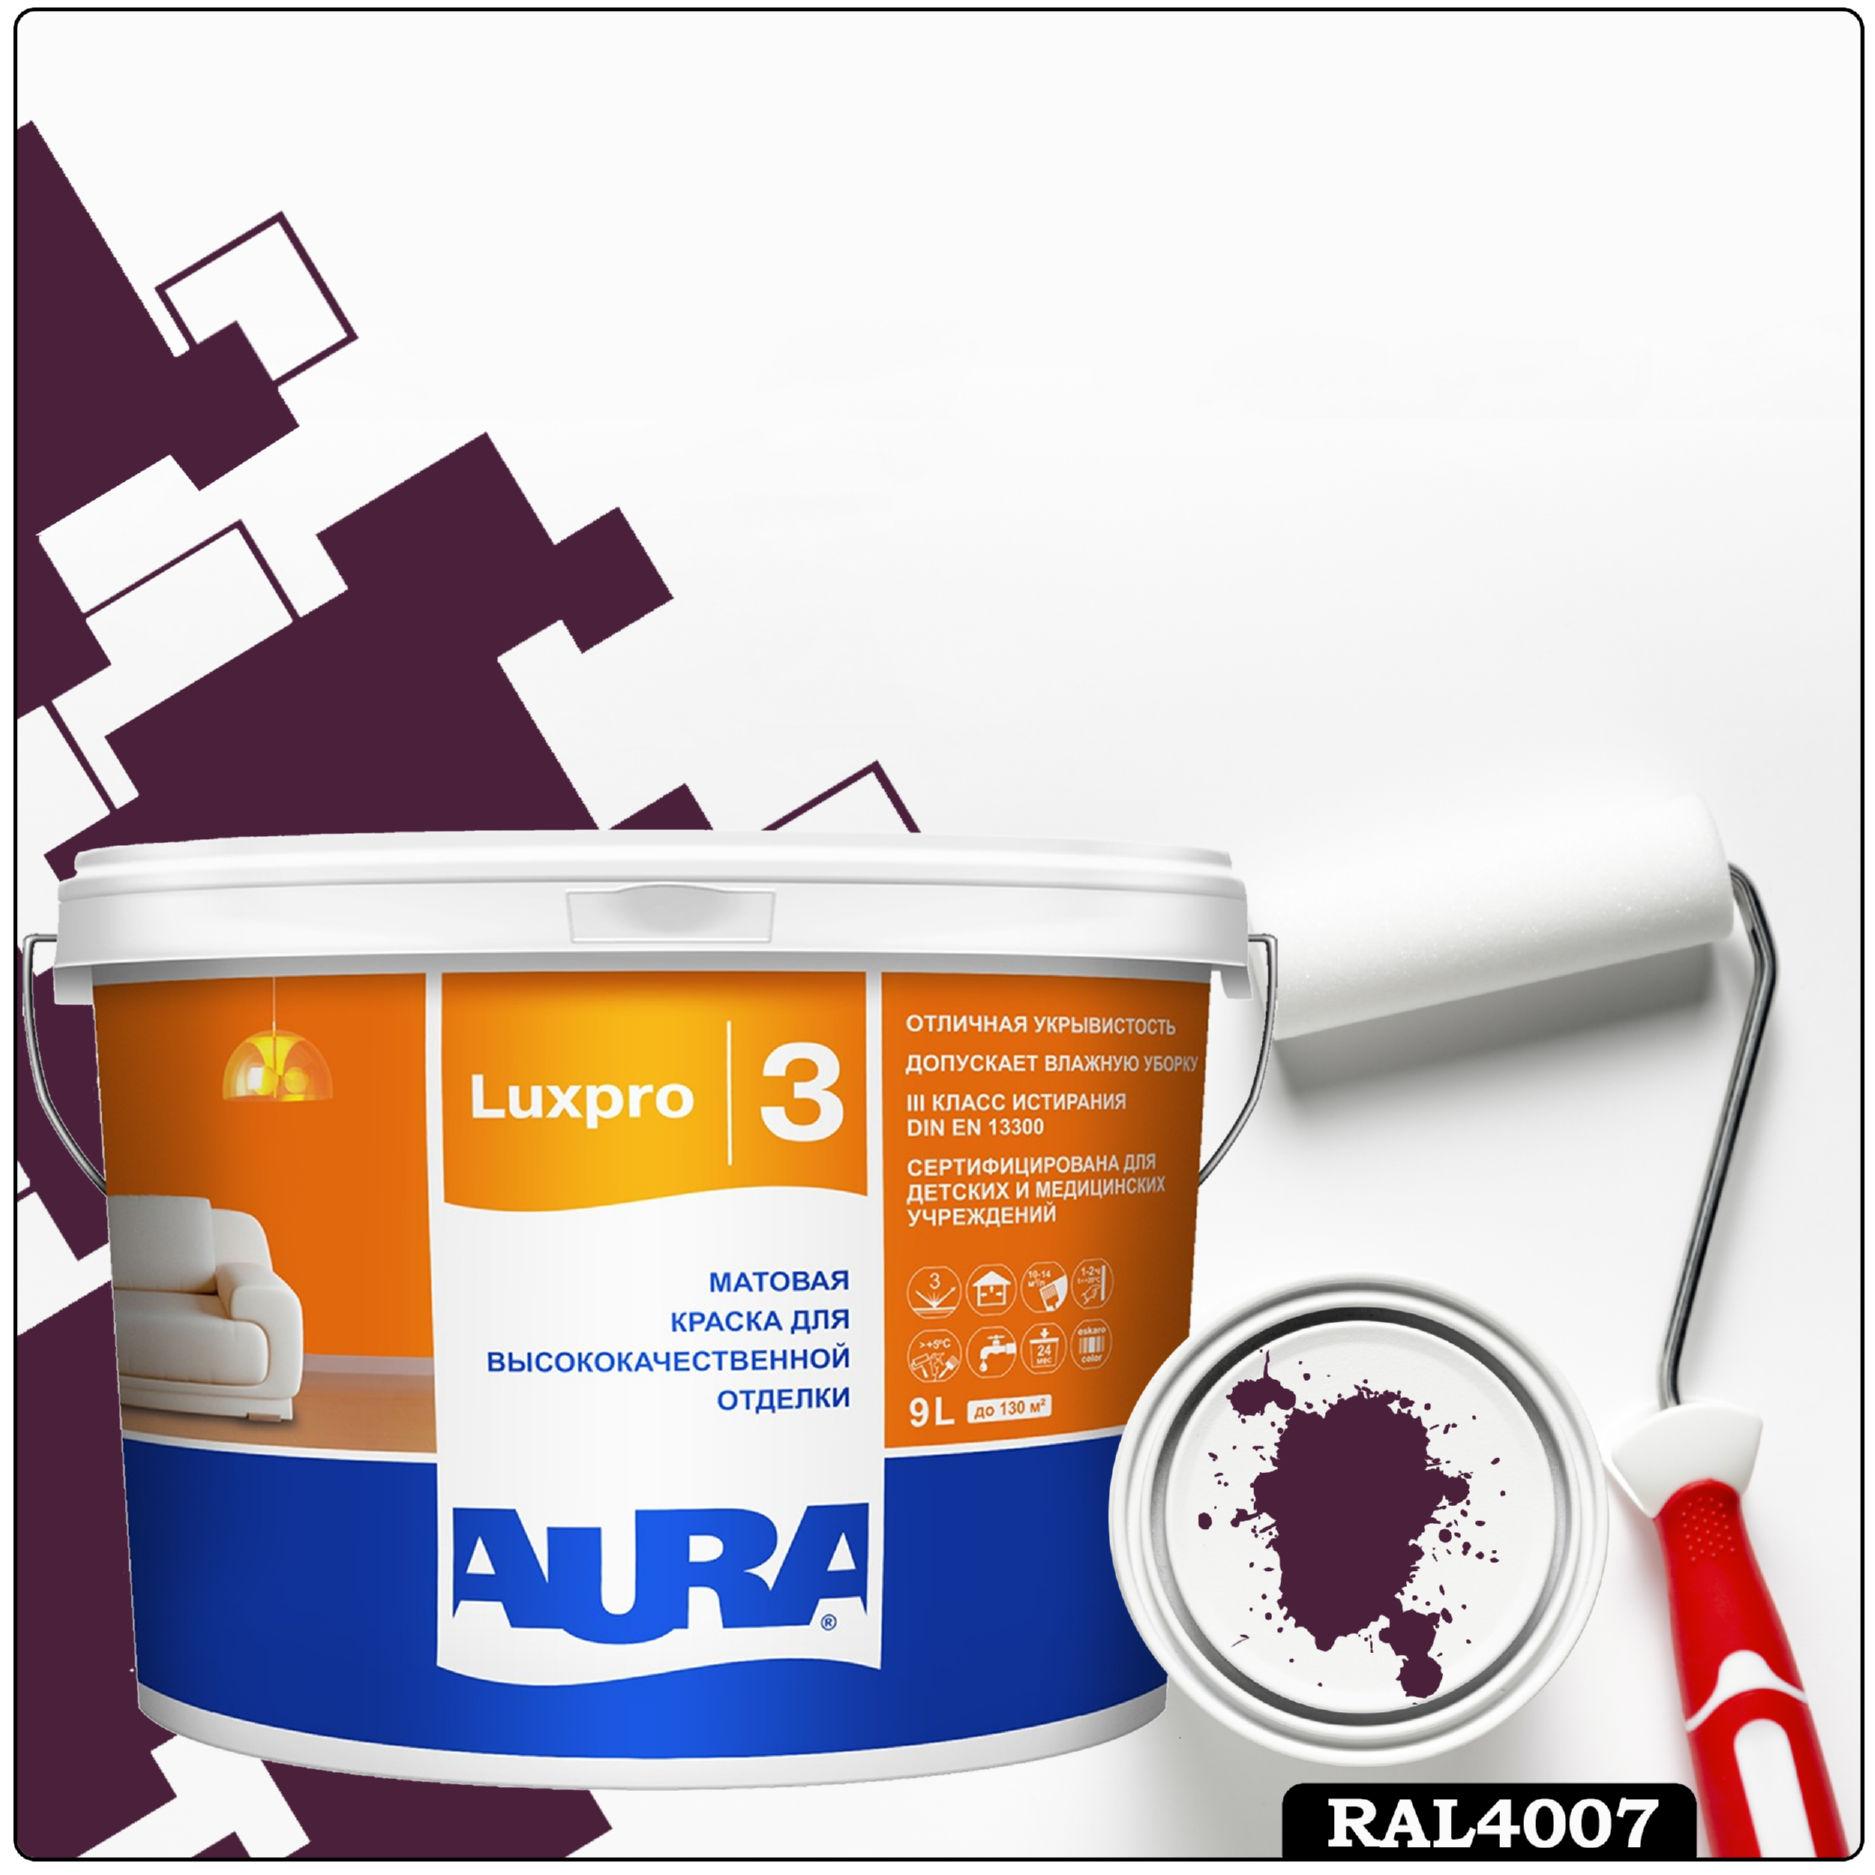 Фото 7 - Краска Aura LuxPRO 3, RAL 4007 Пурпурно-фиолетовый, латексная, шелково-матовая, интерьерная, 9л, Аура.